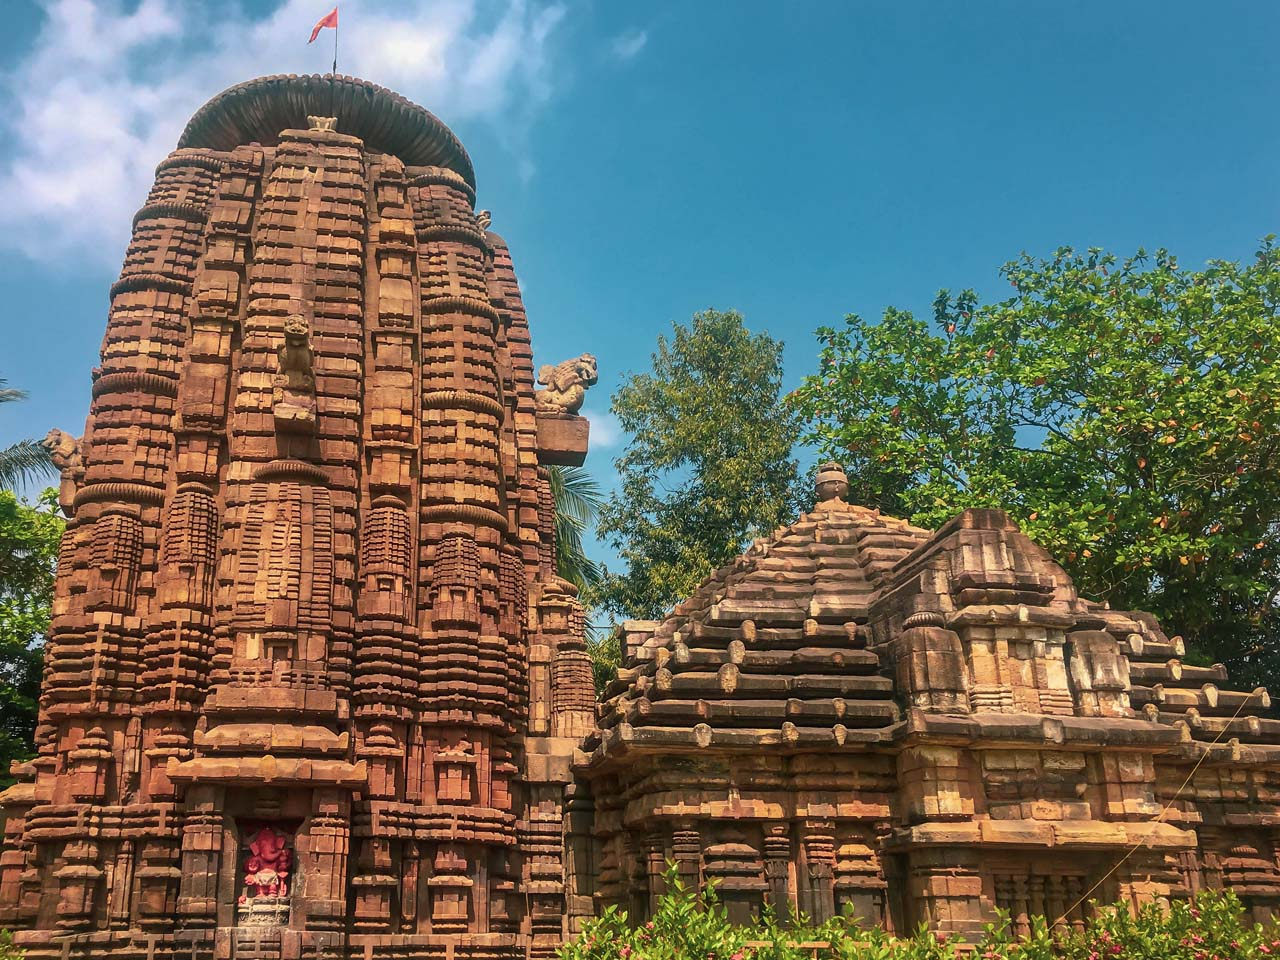 Lingaraja Temple in Bhuvneshwar, Orissa